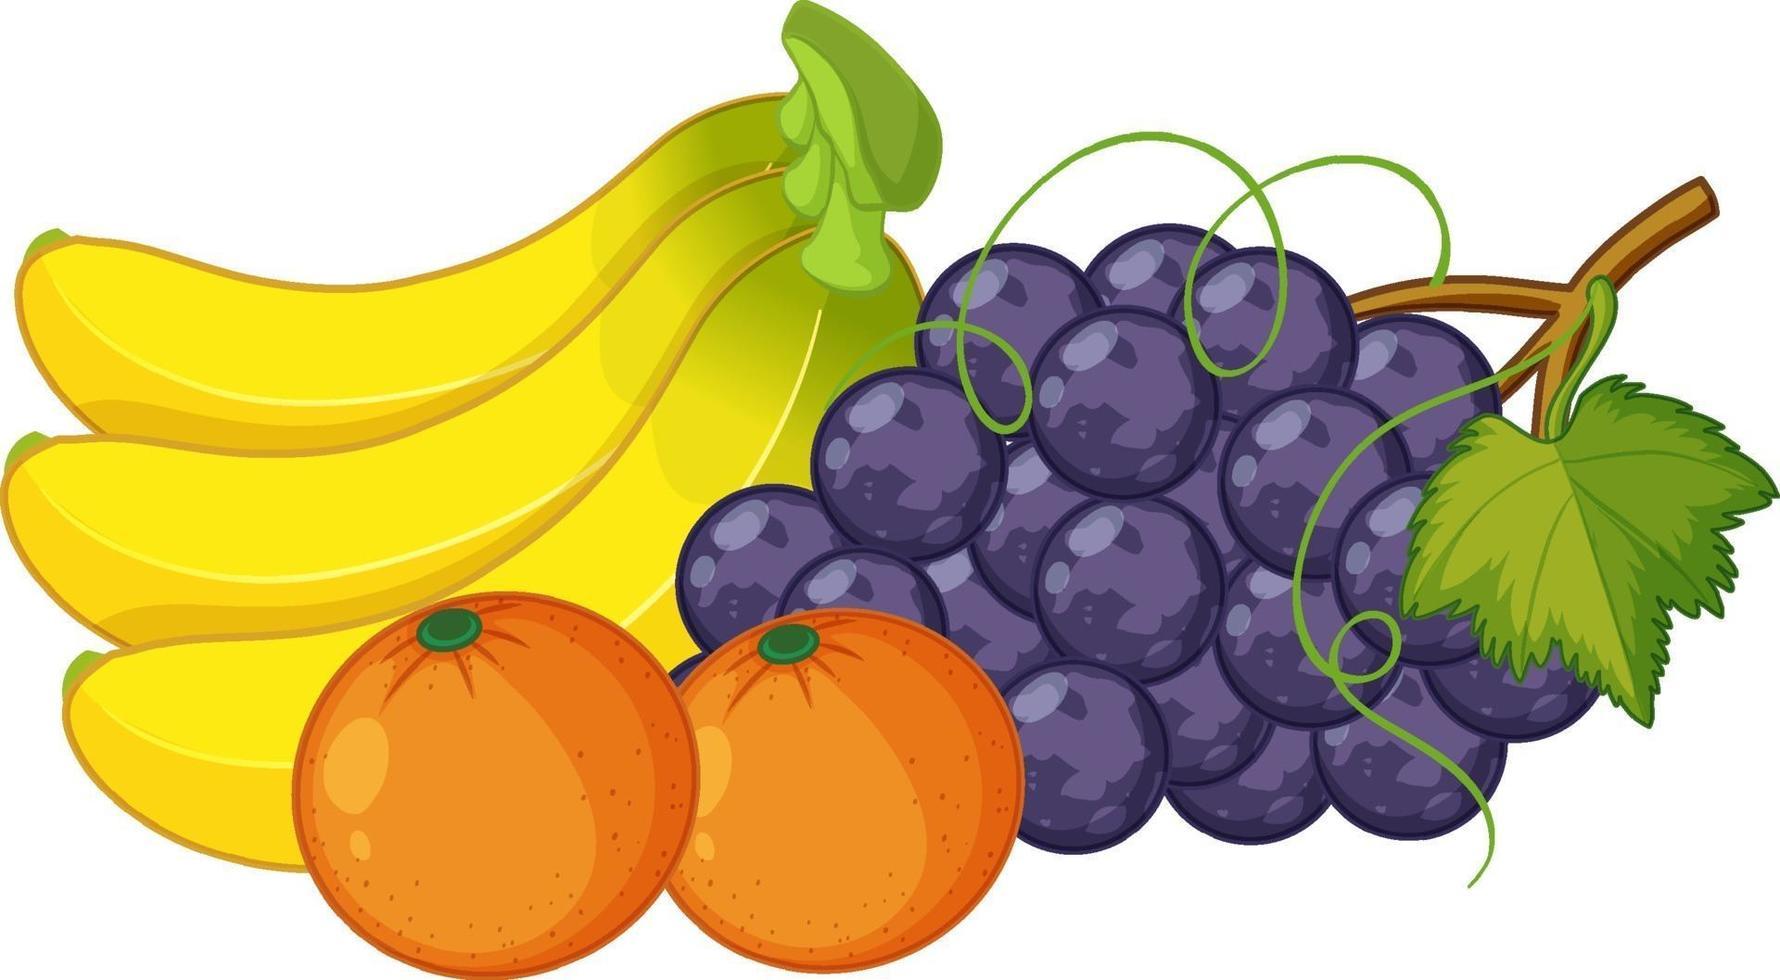 Grupo de frutas aislado sobre fondo blanco. vector